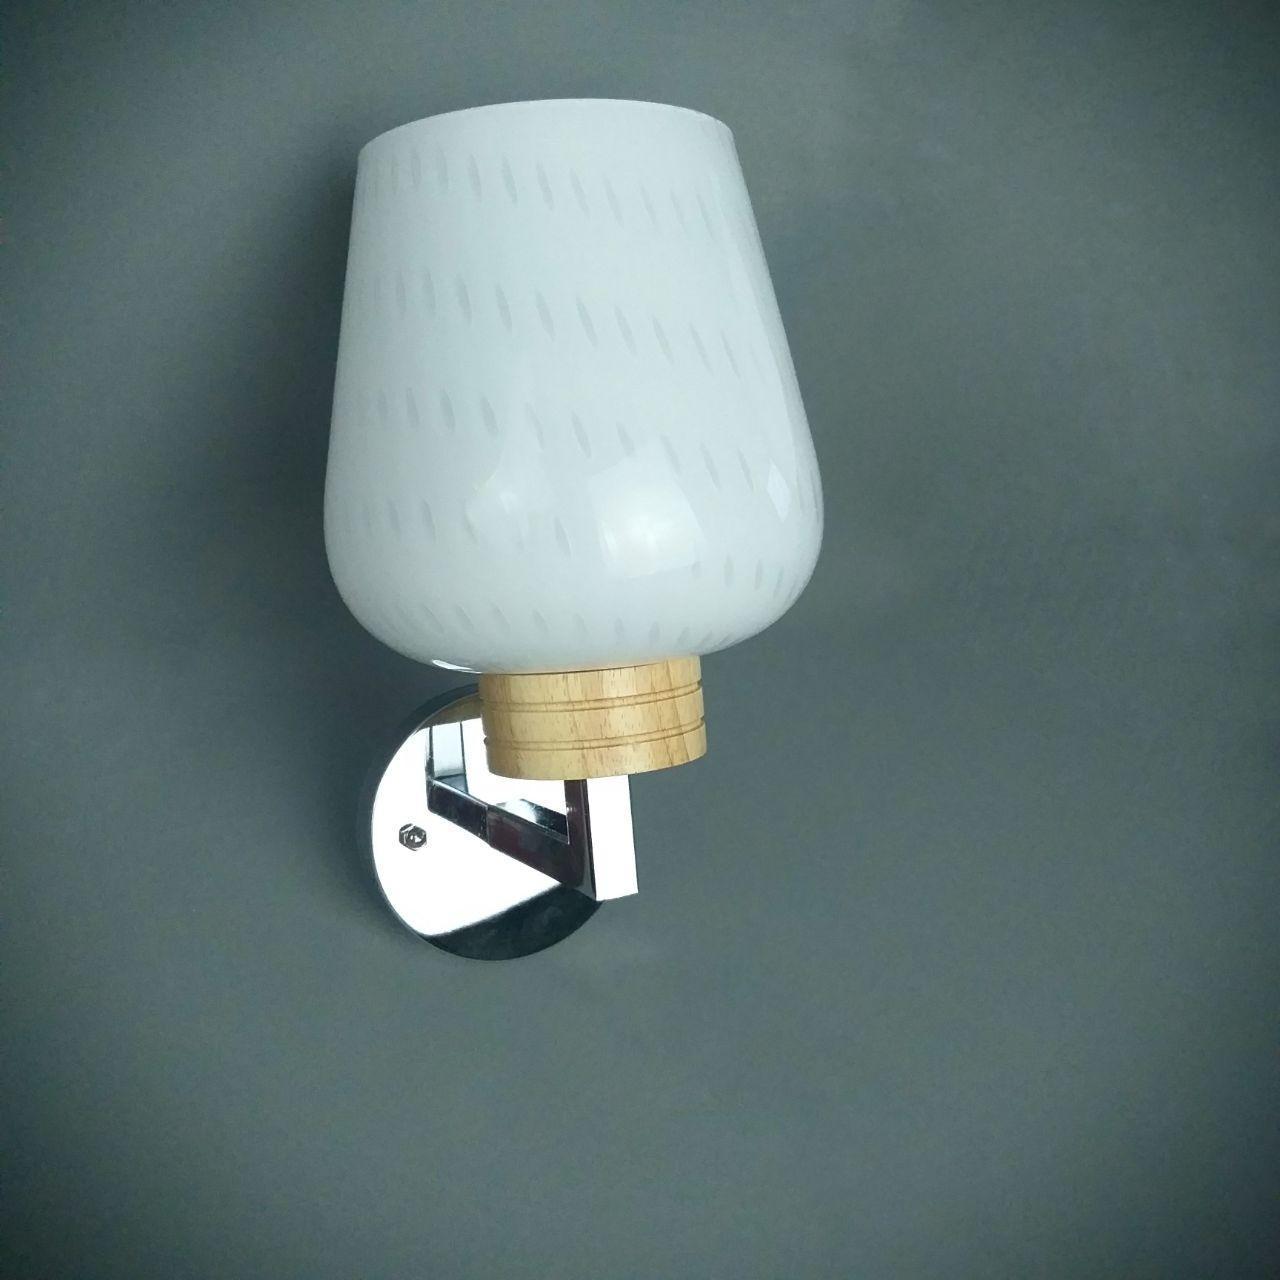 Бра на одну лампу с белым плафоном и деревянным декором  HQ-8215/1W (12шт)